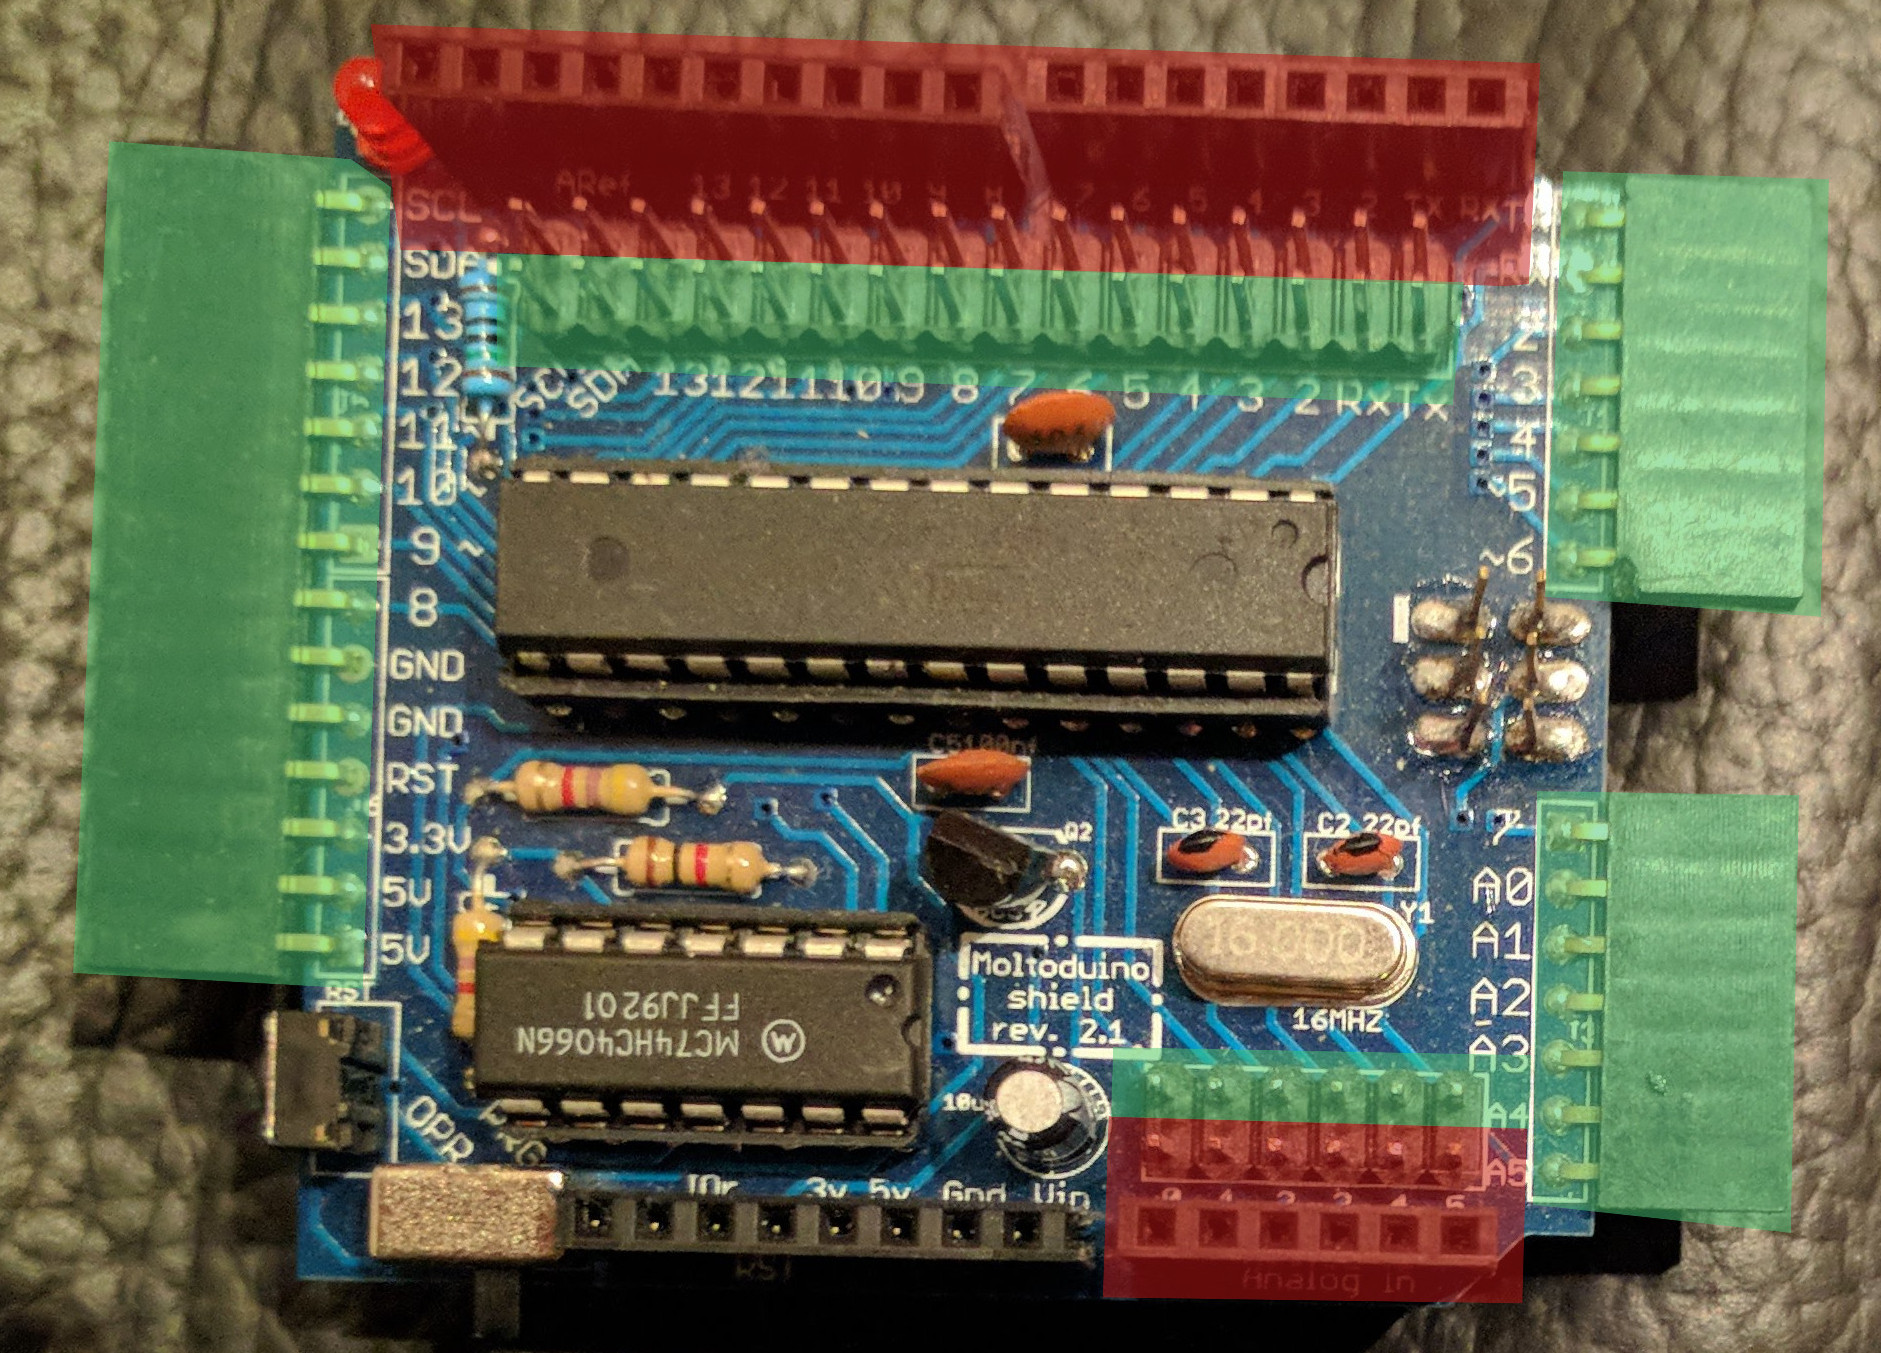 Moltoduino pin grouping